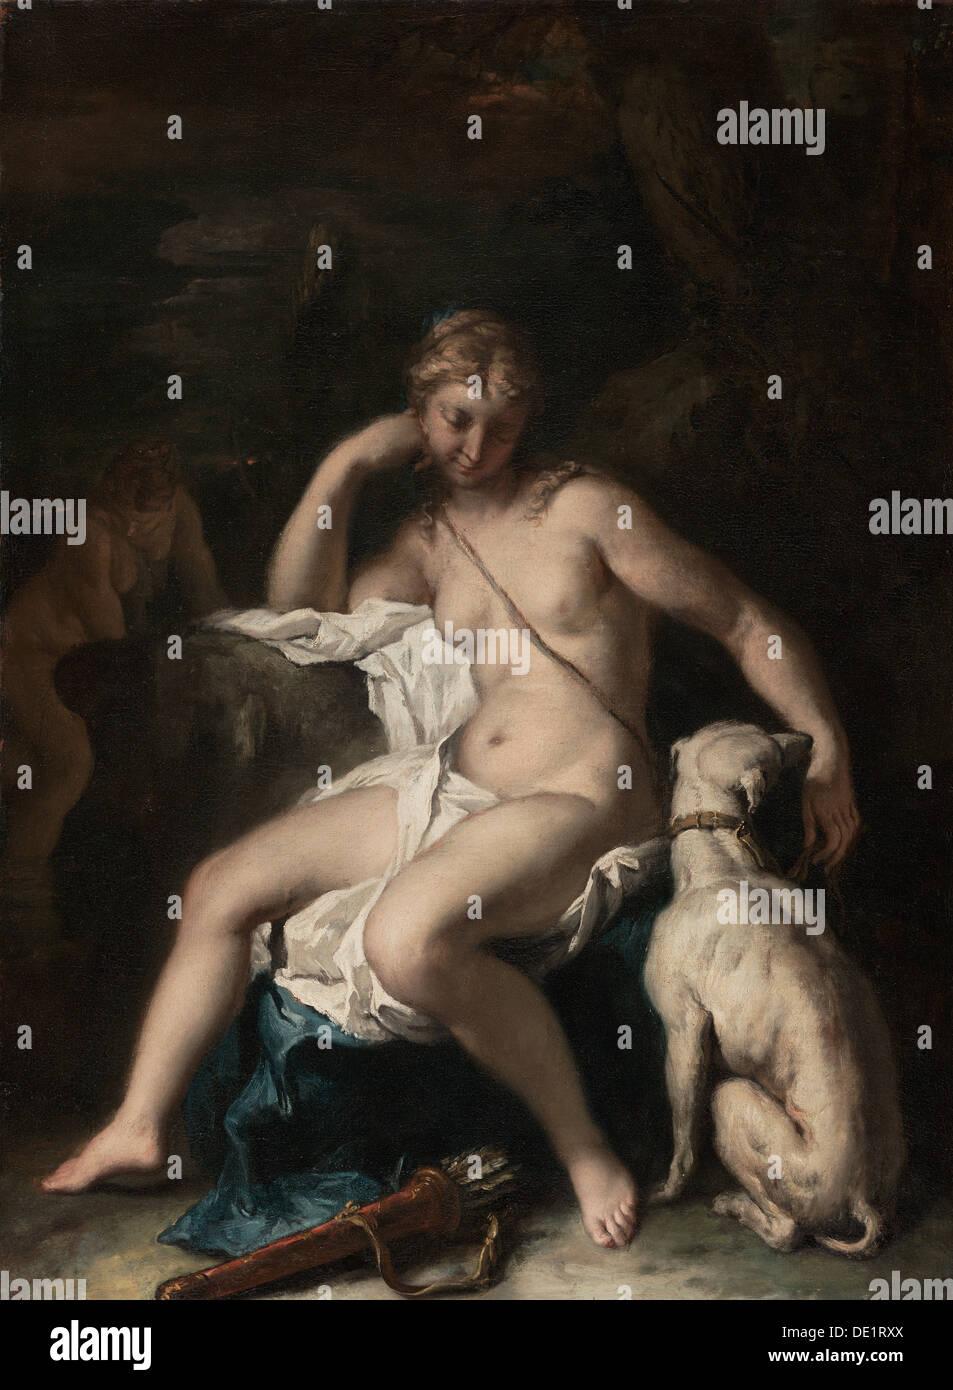 Diana and Her Dog; Sebastiano Ricci, Italian, 1659 - 1734; 1717 - 1720; Oil on canvas; Unframed: 74 x 55.6 cm (29 Stock Photo